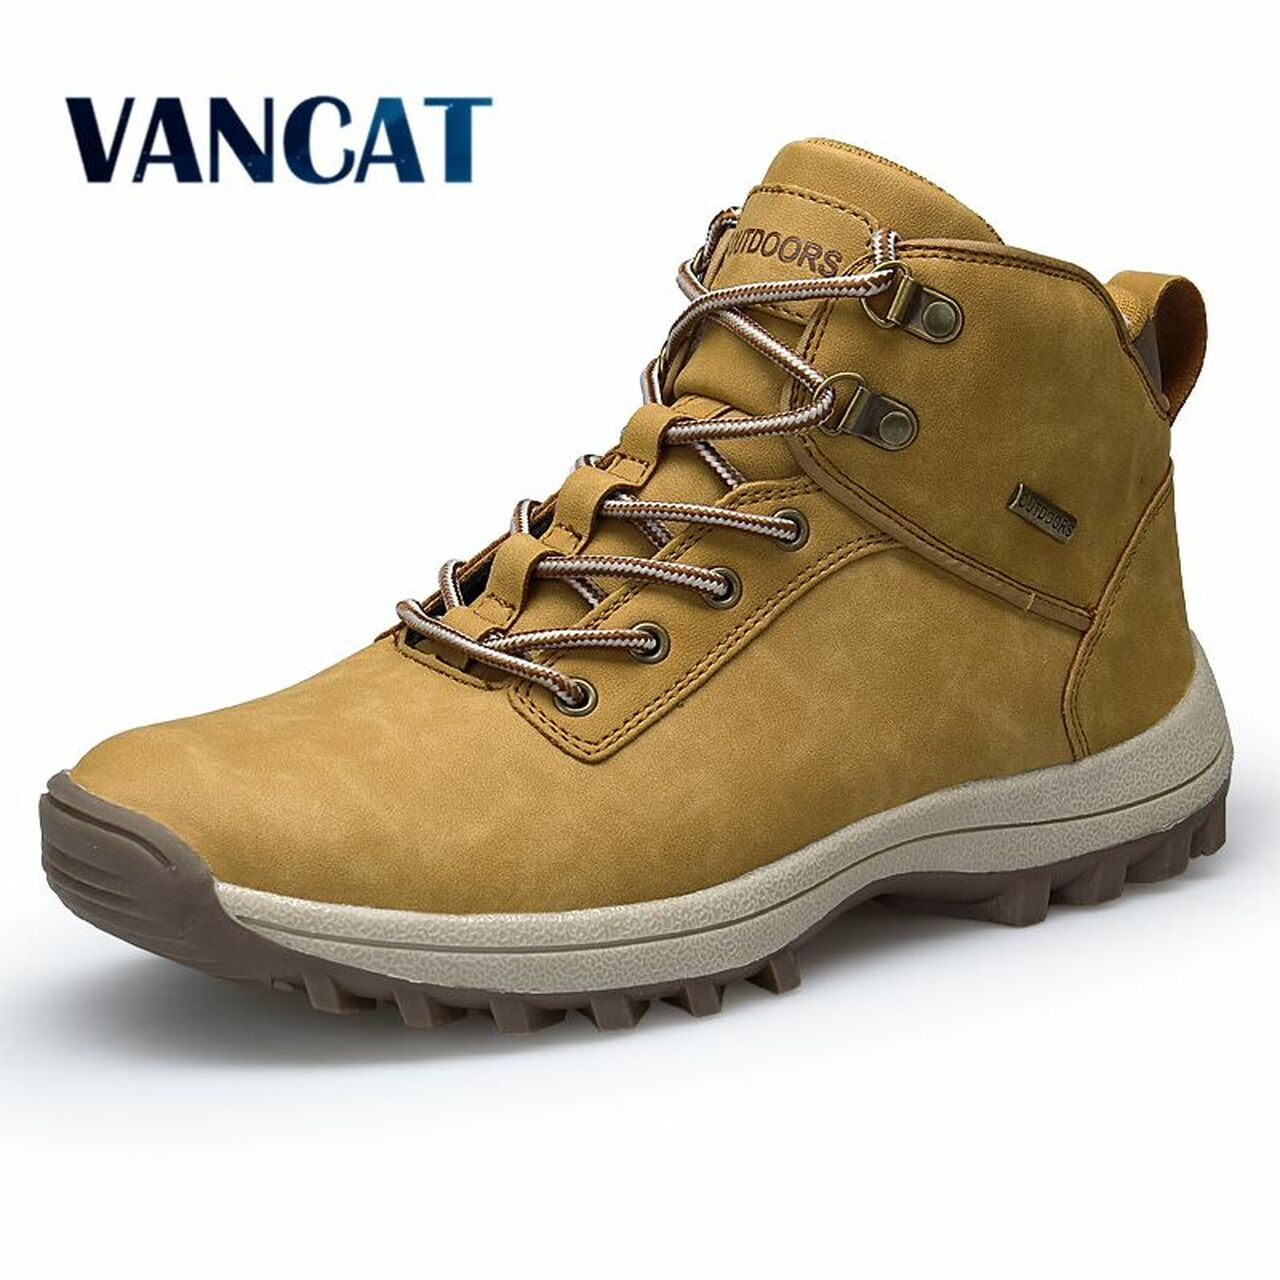 786cbb5522 VANCAT Brand Men Boots Big Size 39-46 Autumn Winter Mens Leather Fashion  Sneakers Lace Up Outdoor Mountain Men Shoes Waterproof - OnshopDeals.Com